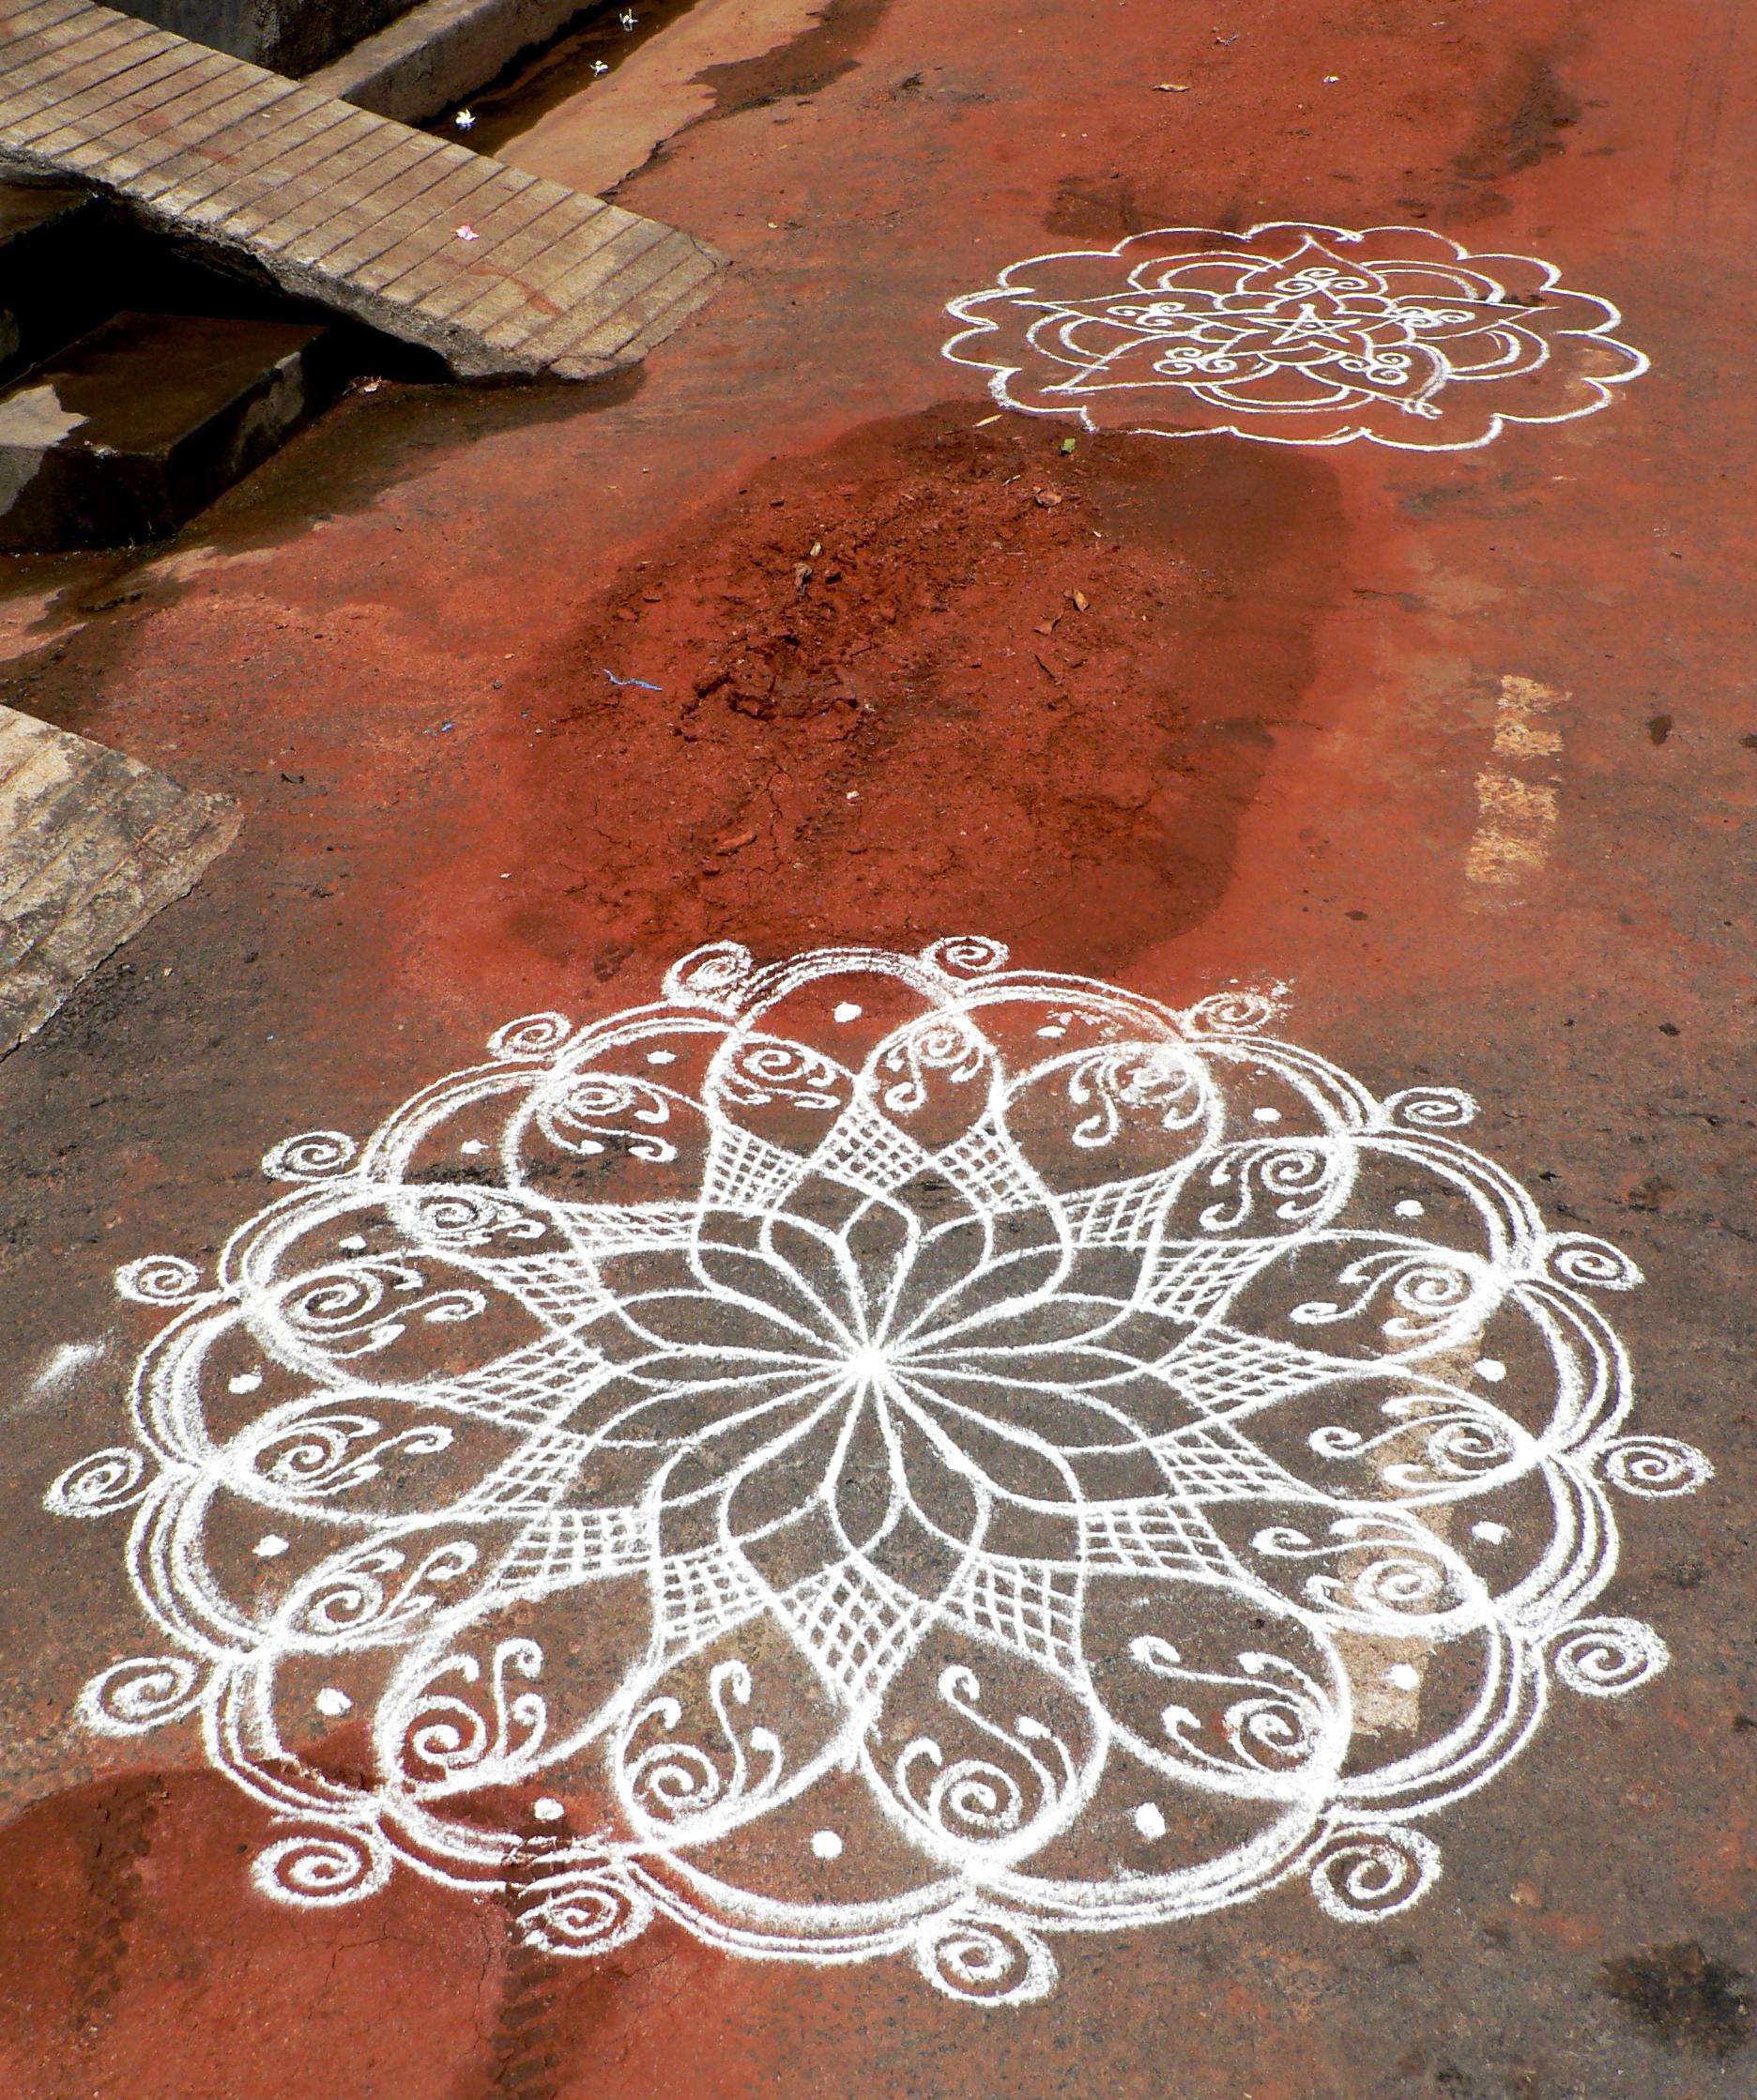 Tattoo Designs Tamil: Geometry On The Pavement